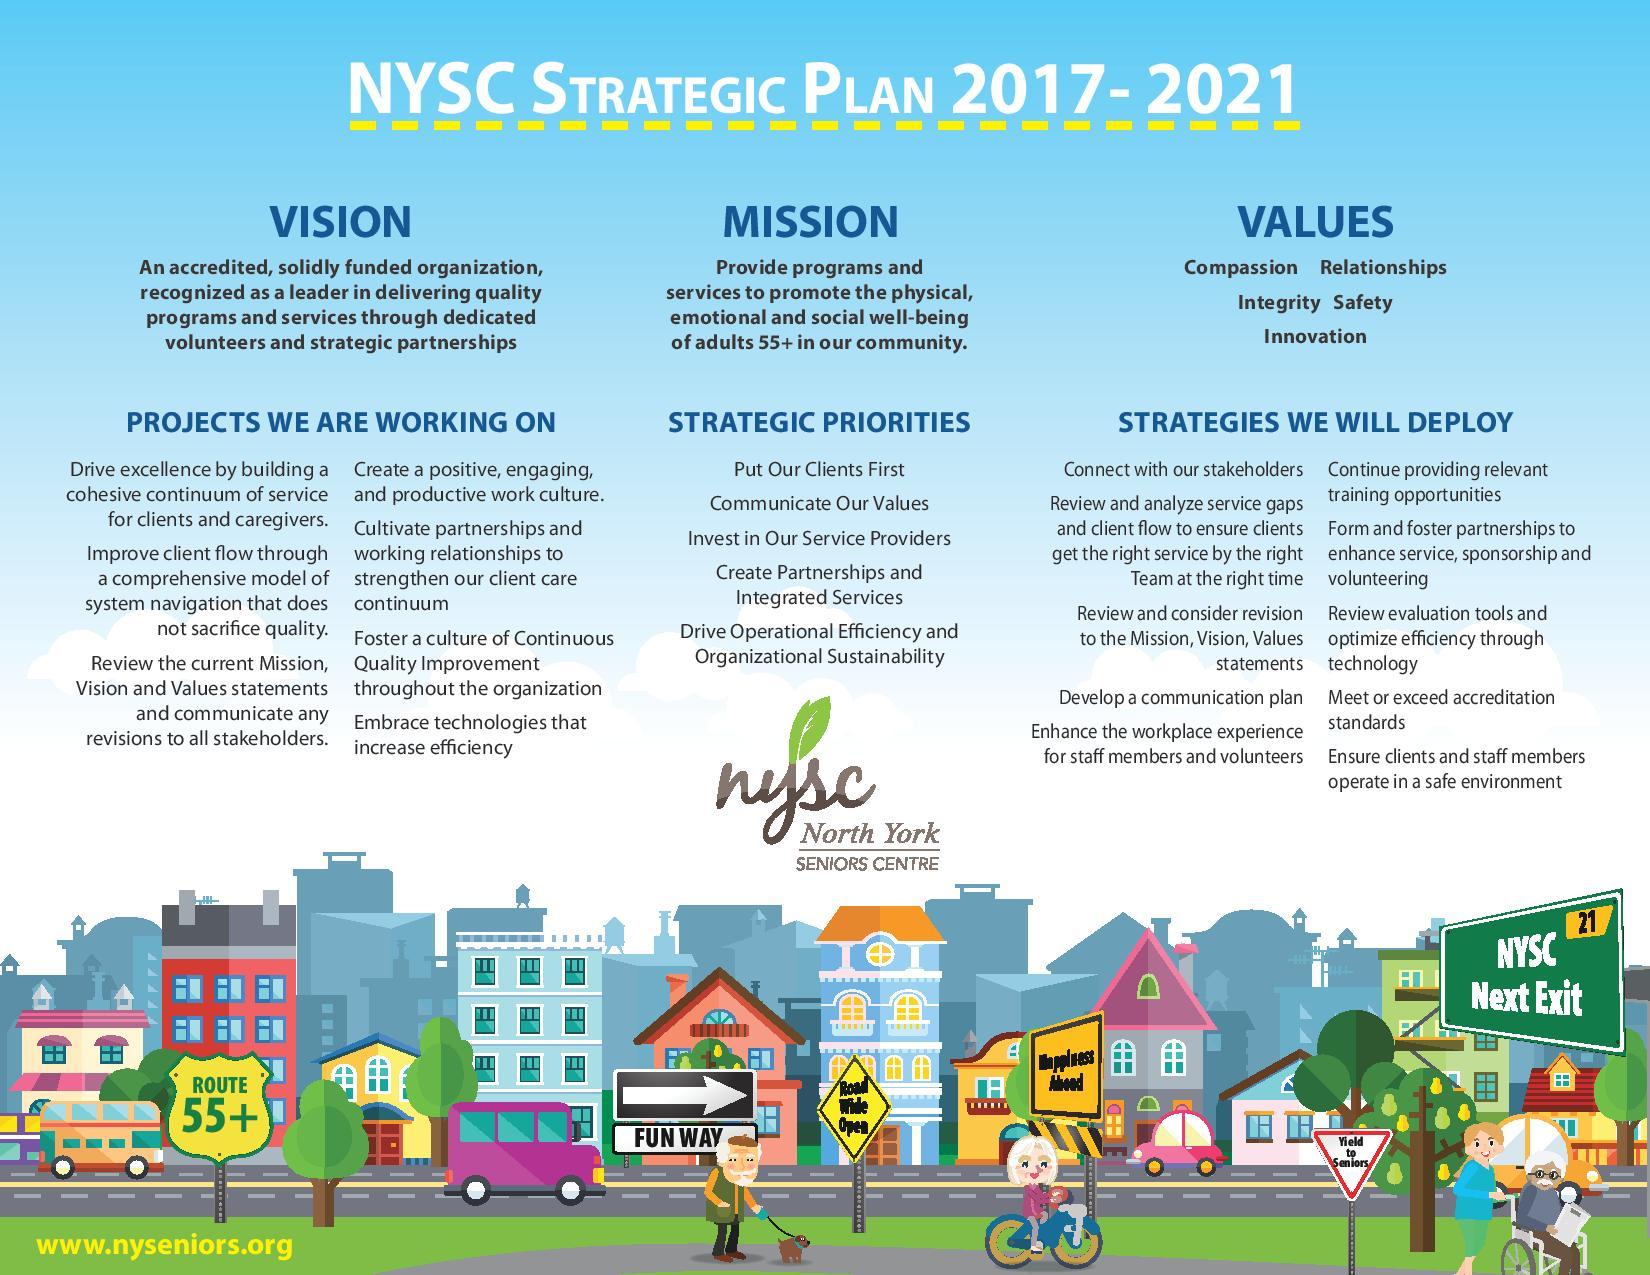 NYSC Strategic Plan